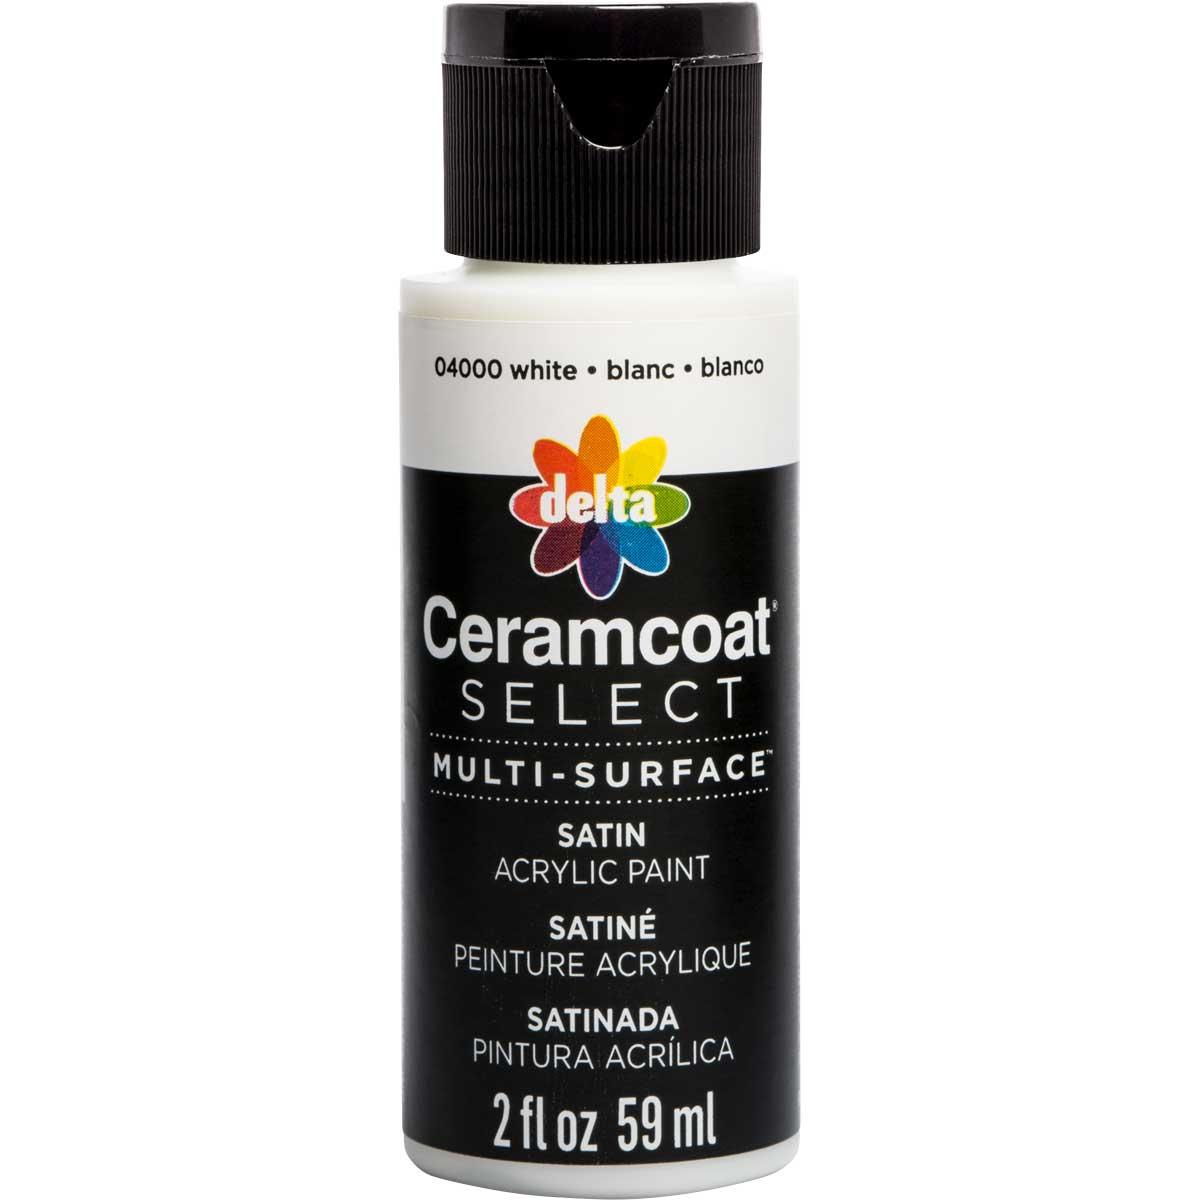 Delta Ceramcoat ® Select Multi-Surface Acrylic Paint - Satin - White, 2 oz.